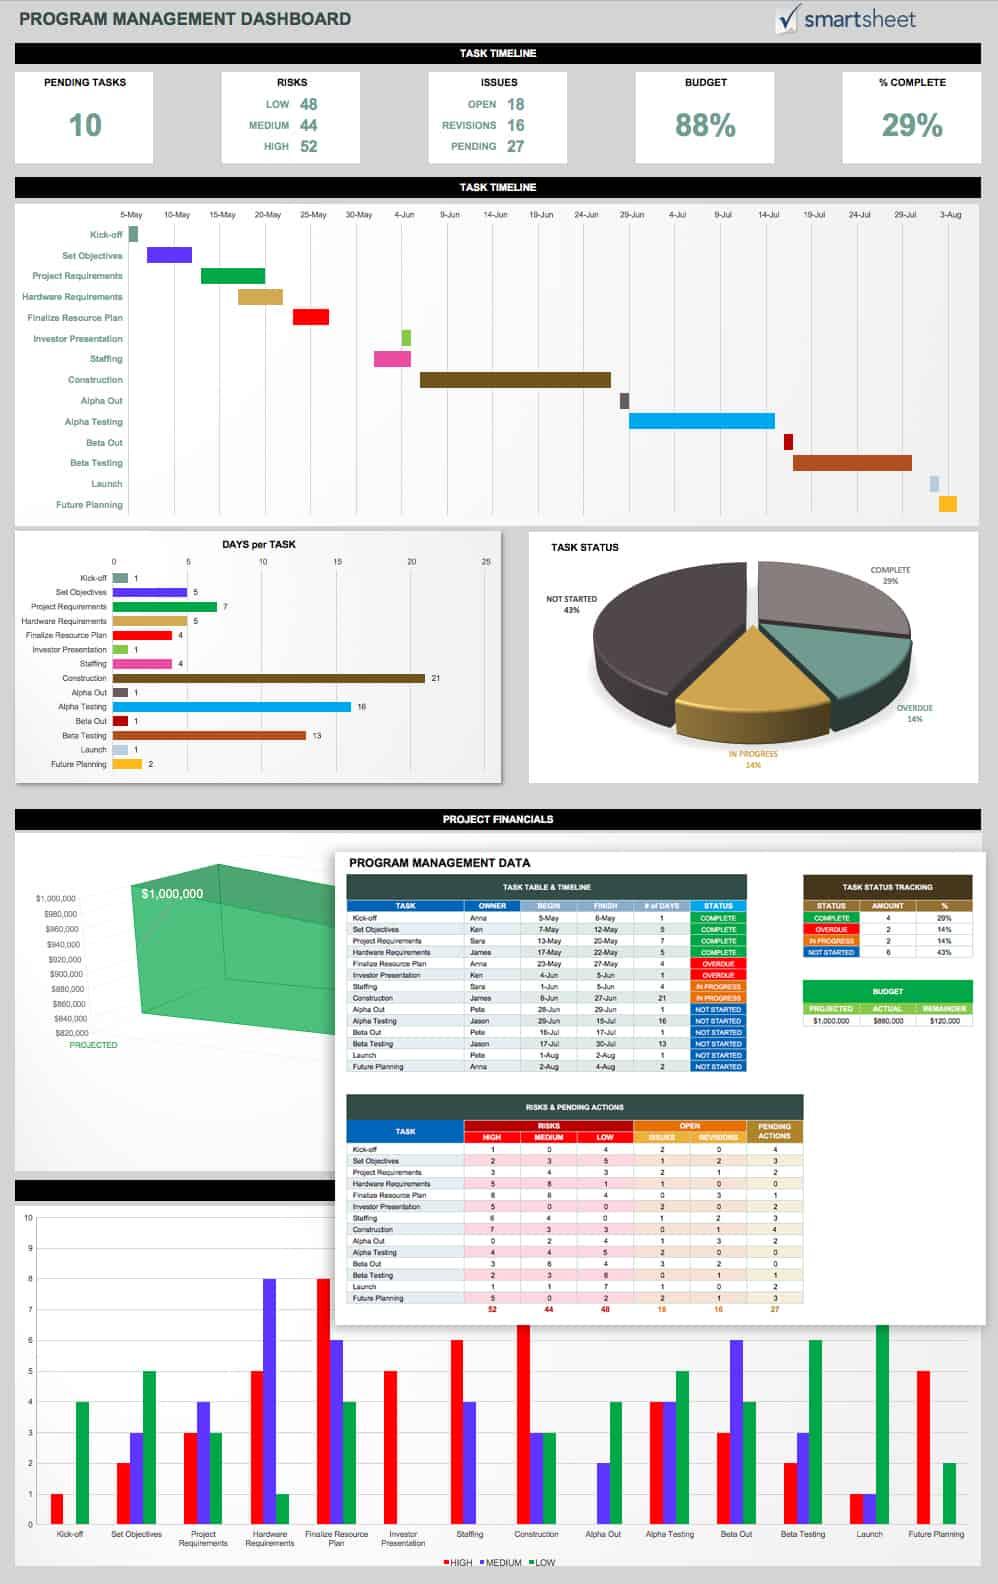 Ic-Programmanagementdashboard.jpg